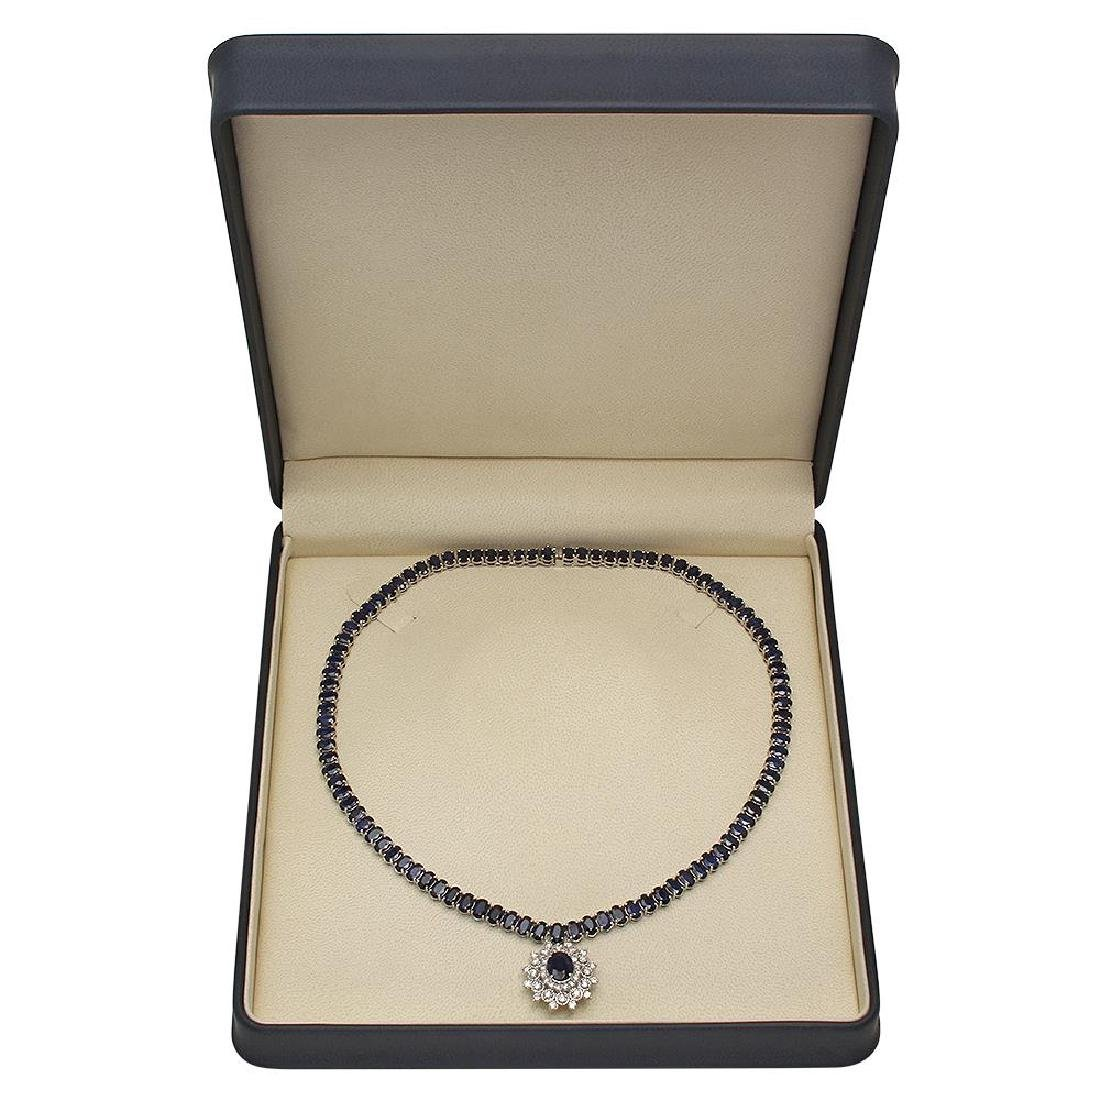 14K Gold 54.01ct Sapphire 2.67ct Diamond Necklace - 4